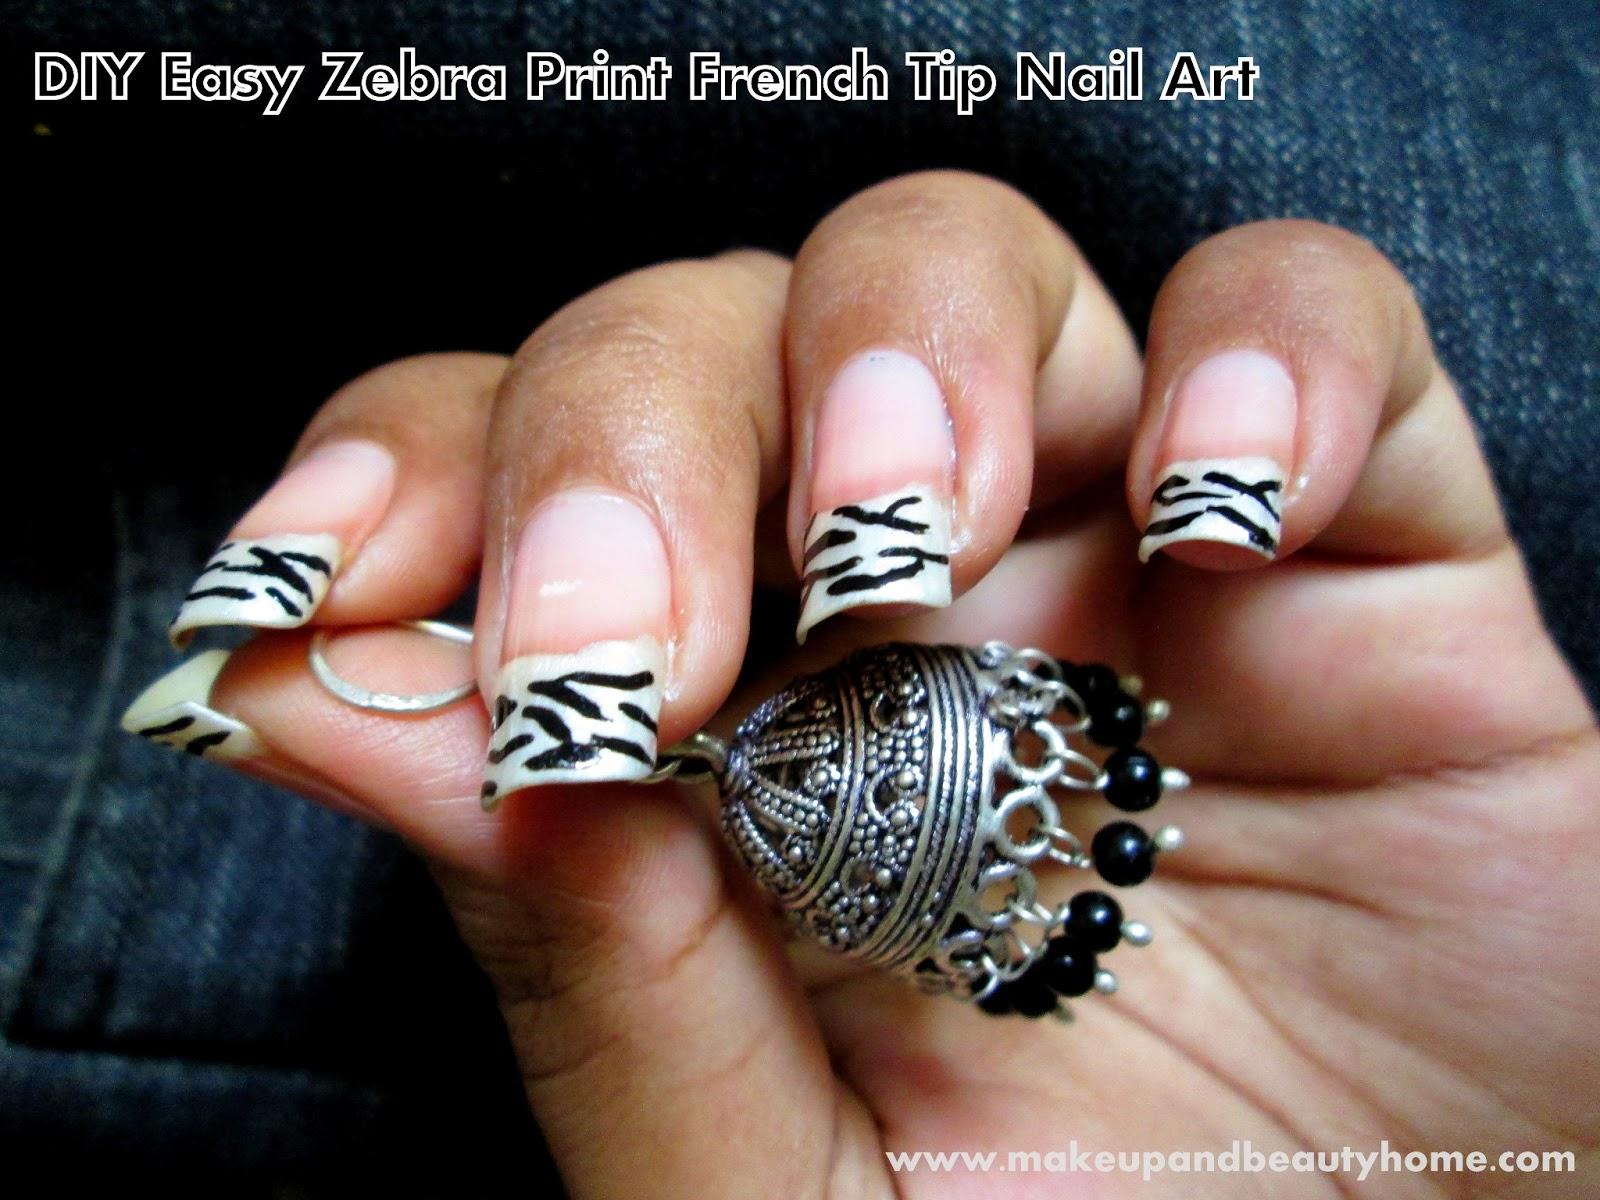 DIY Easy Zebra Print French Tip Nail Art Tutorial - Makeup And ...